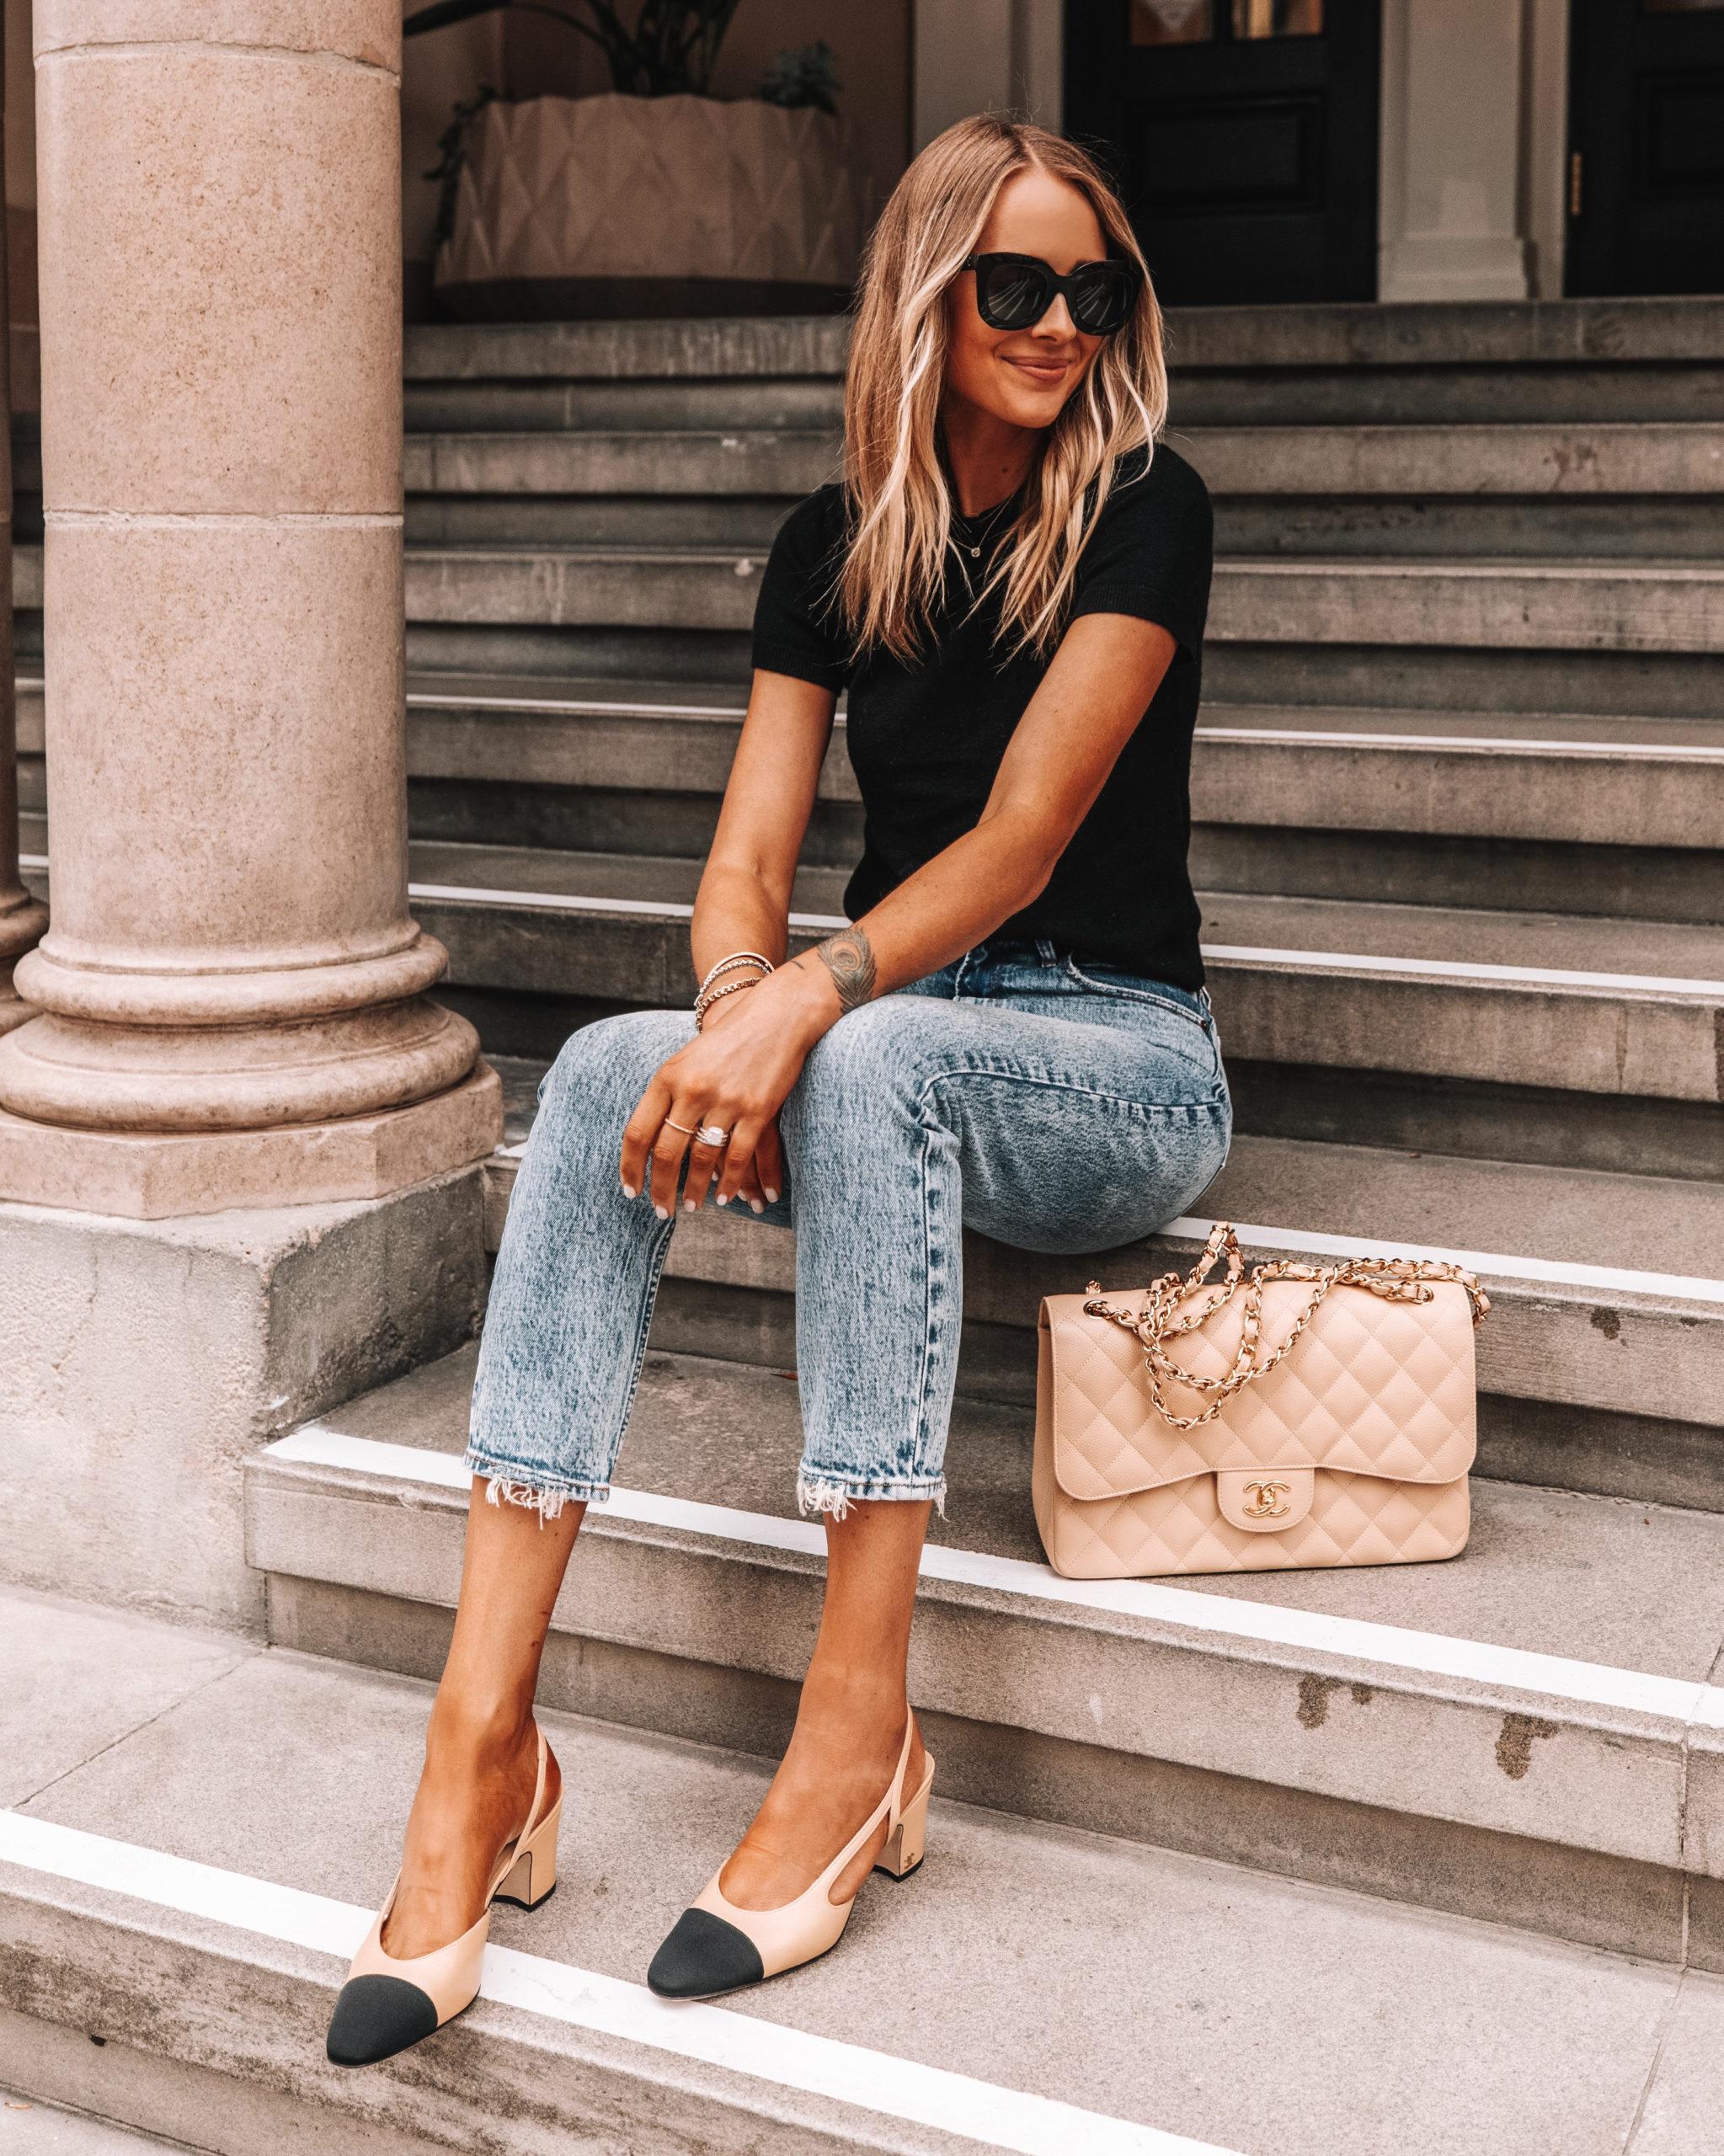 Fashion Jackson Wearing Black Short Sleeve Sweater Abercrombie Jeans Chanel Slingbacks Chanel Beige Handbag